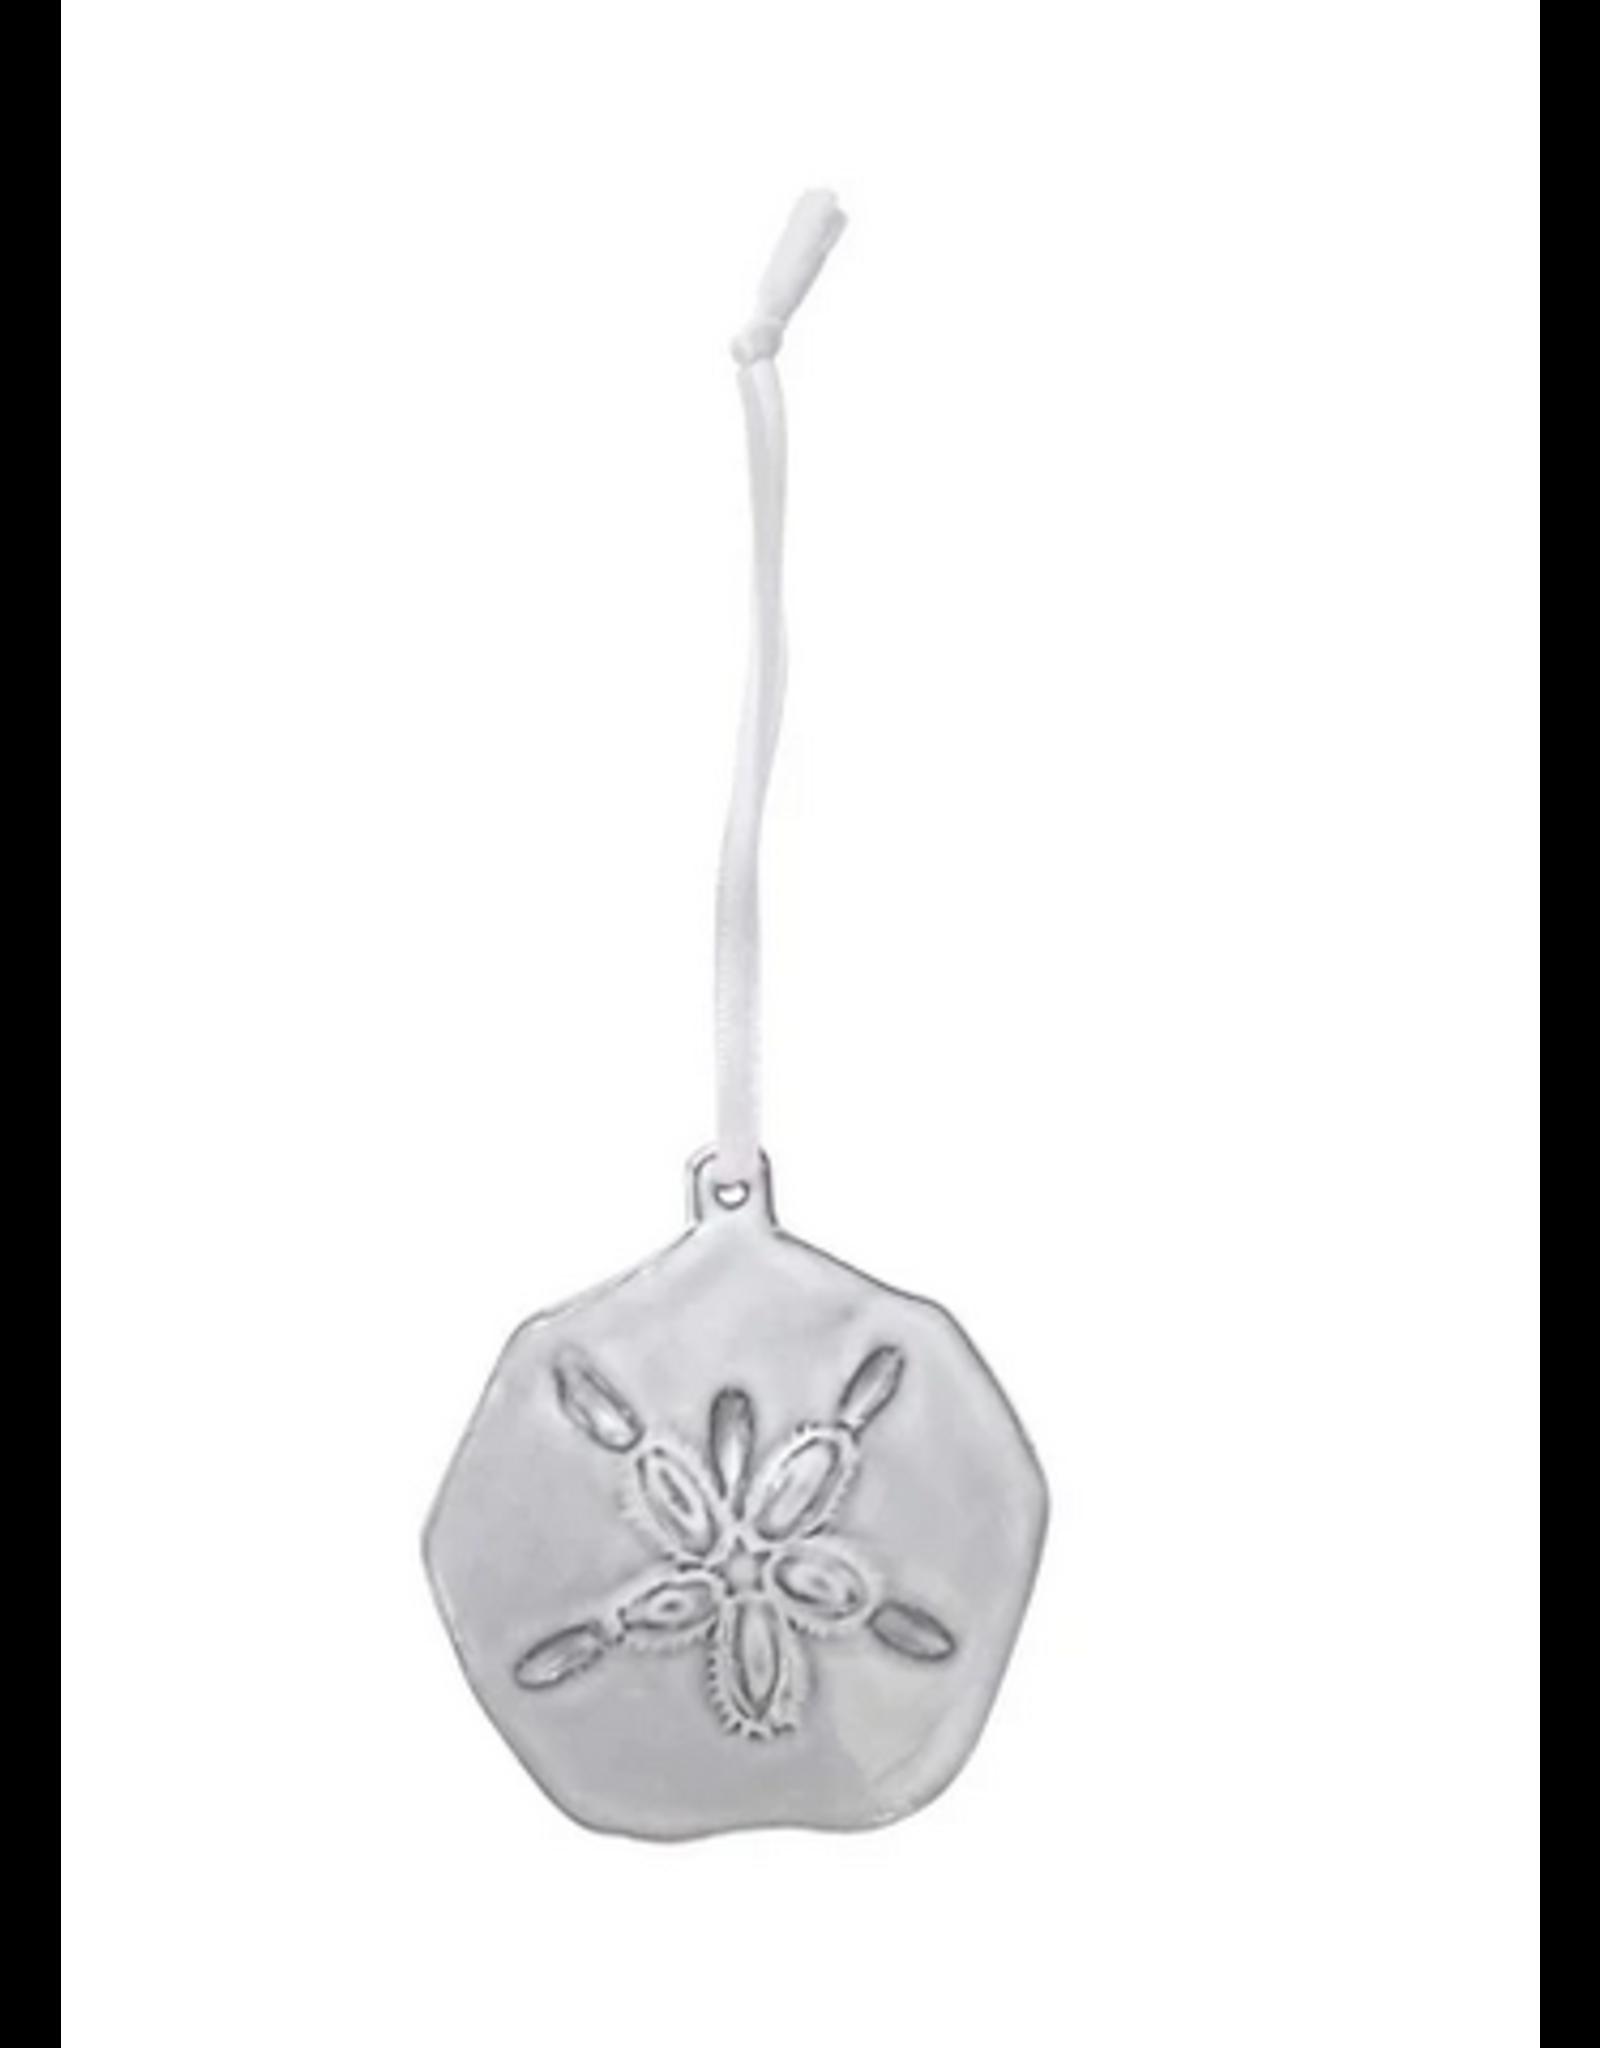 Mariposa Sand Dollar Ceramic Ornament